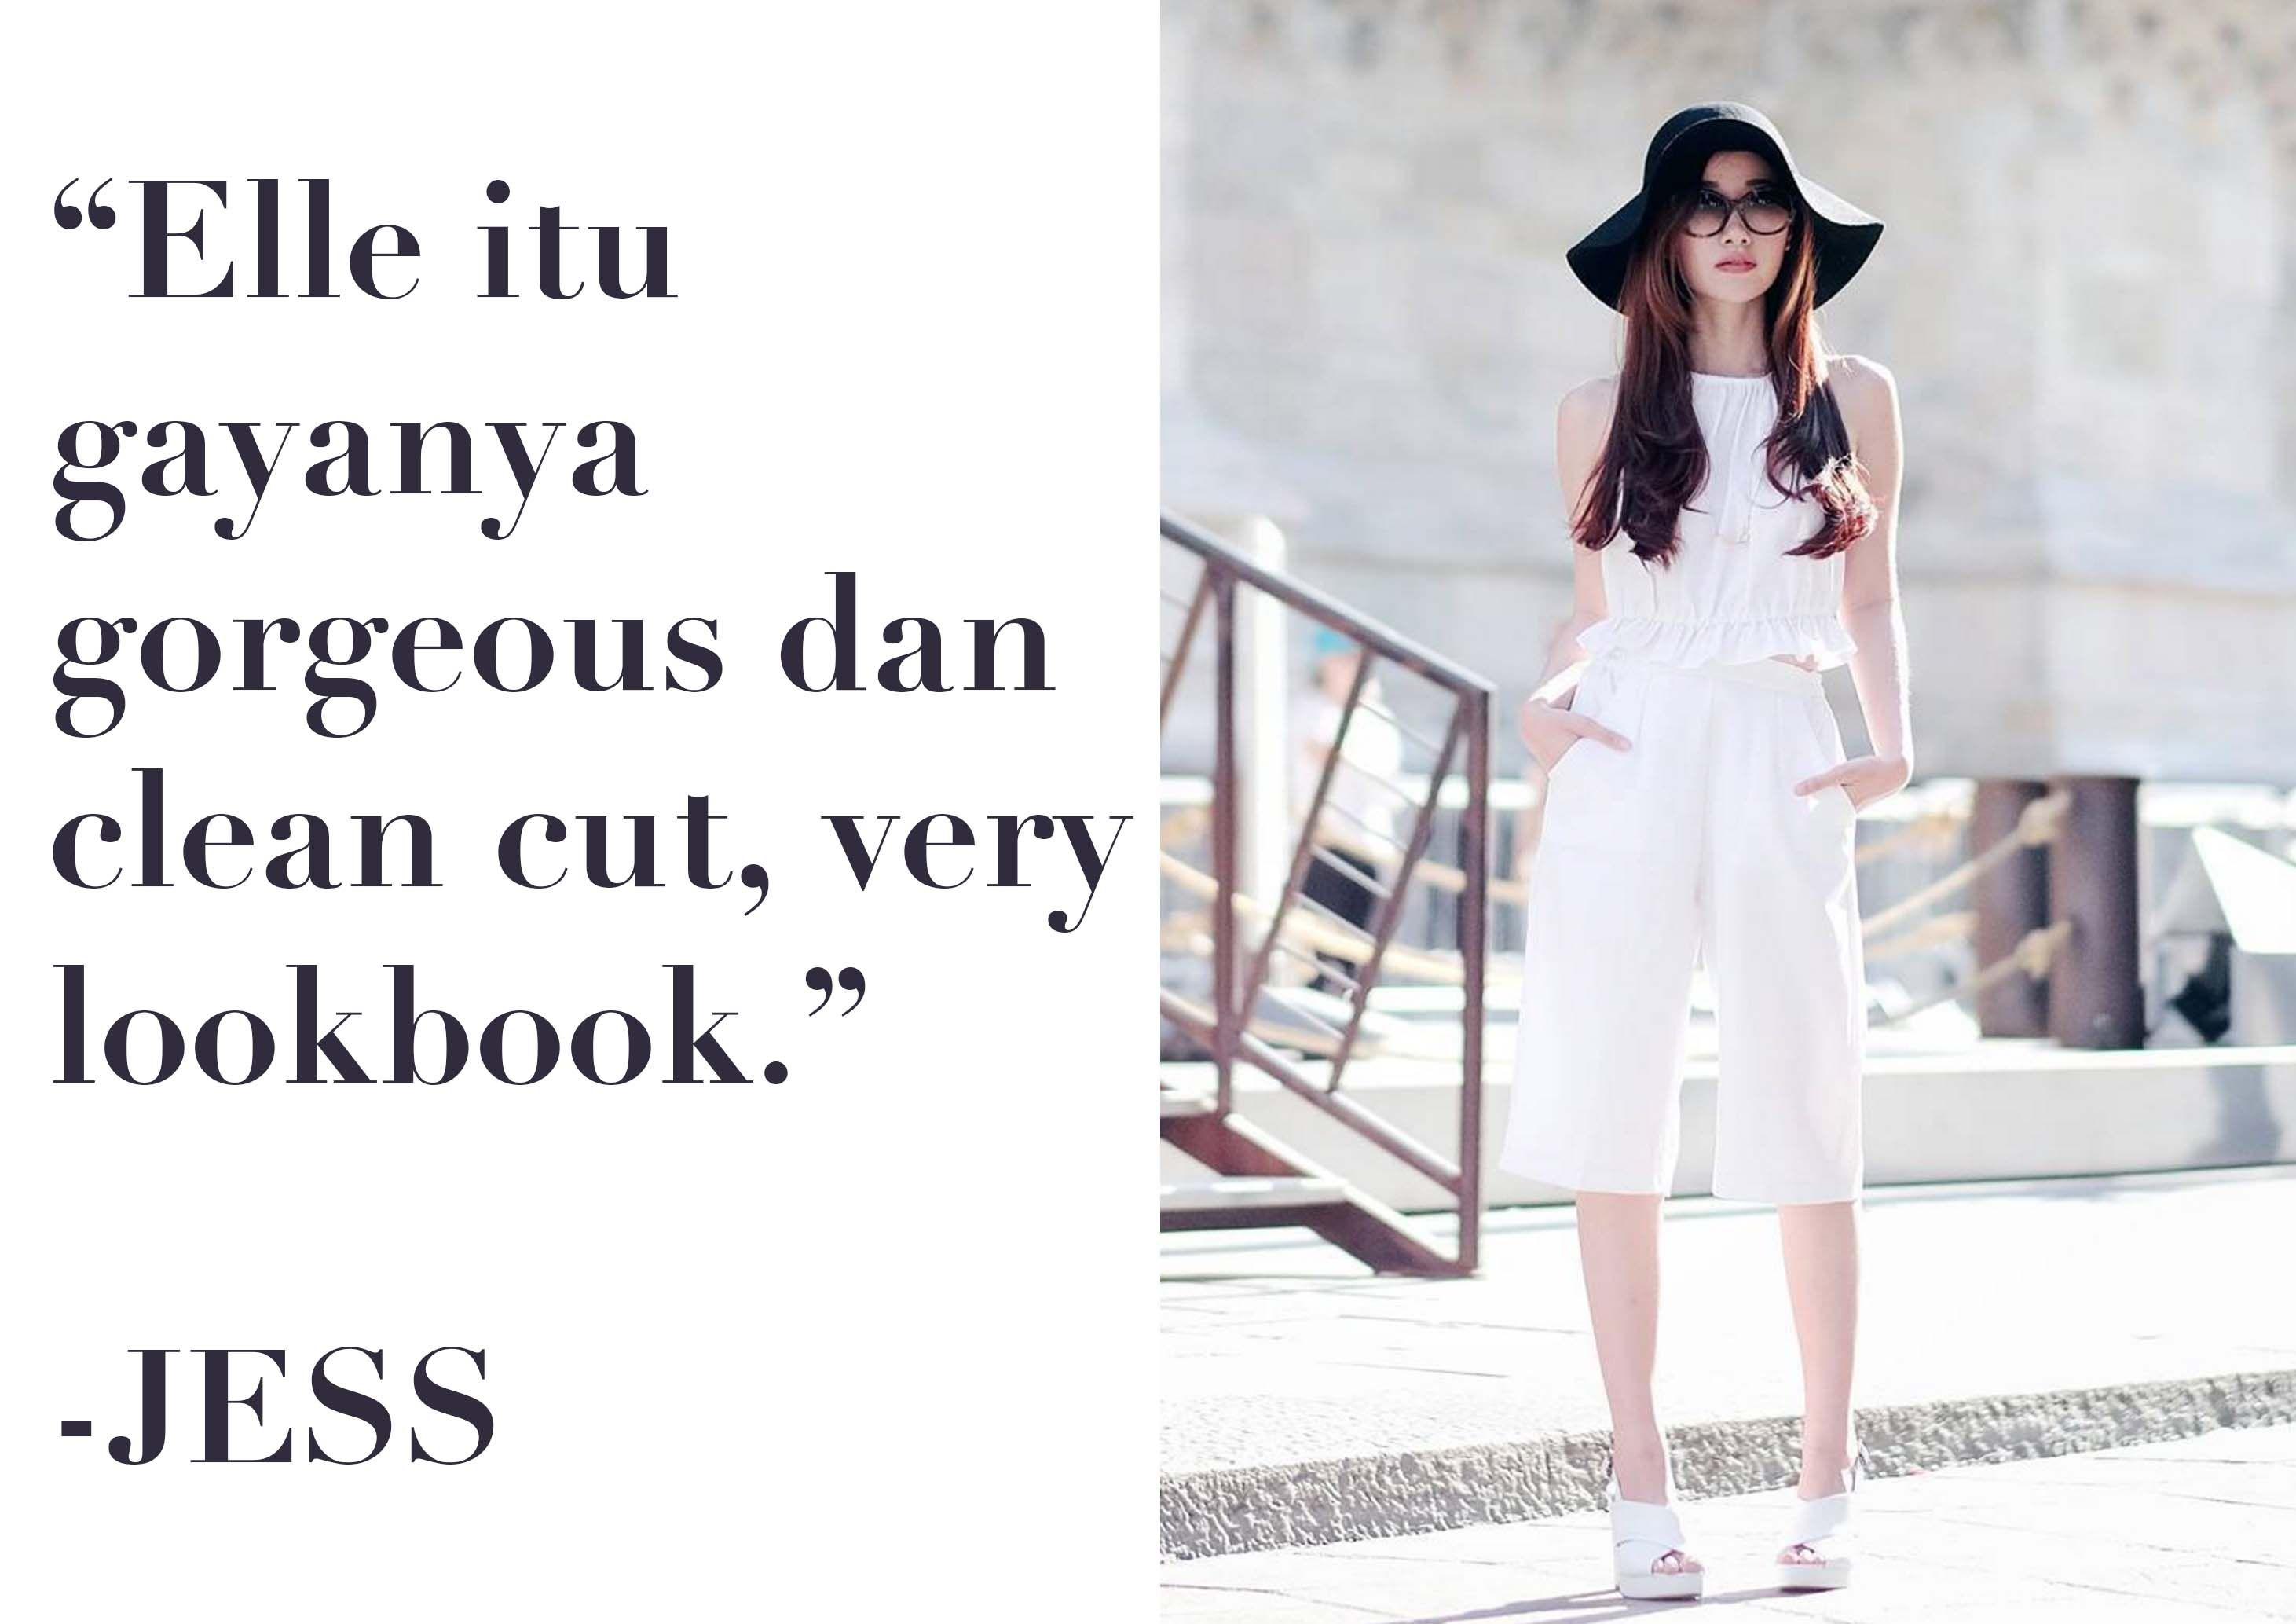 Ini Dia Rahasia di Balik Kekompakan Fashion Blogger Elle & Jess